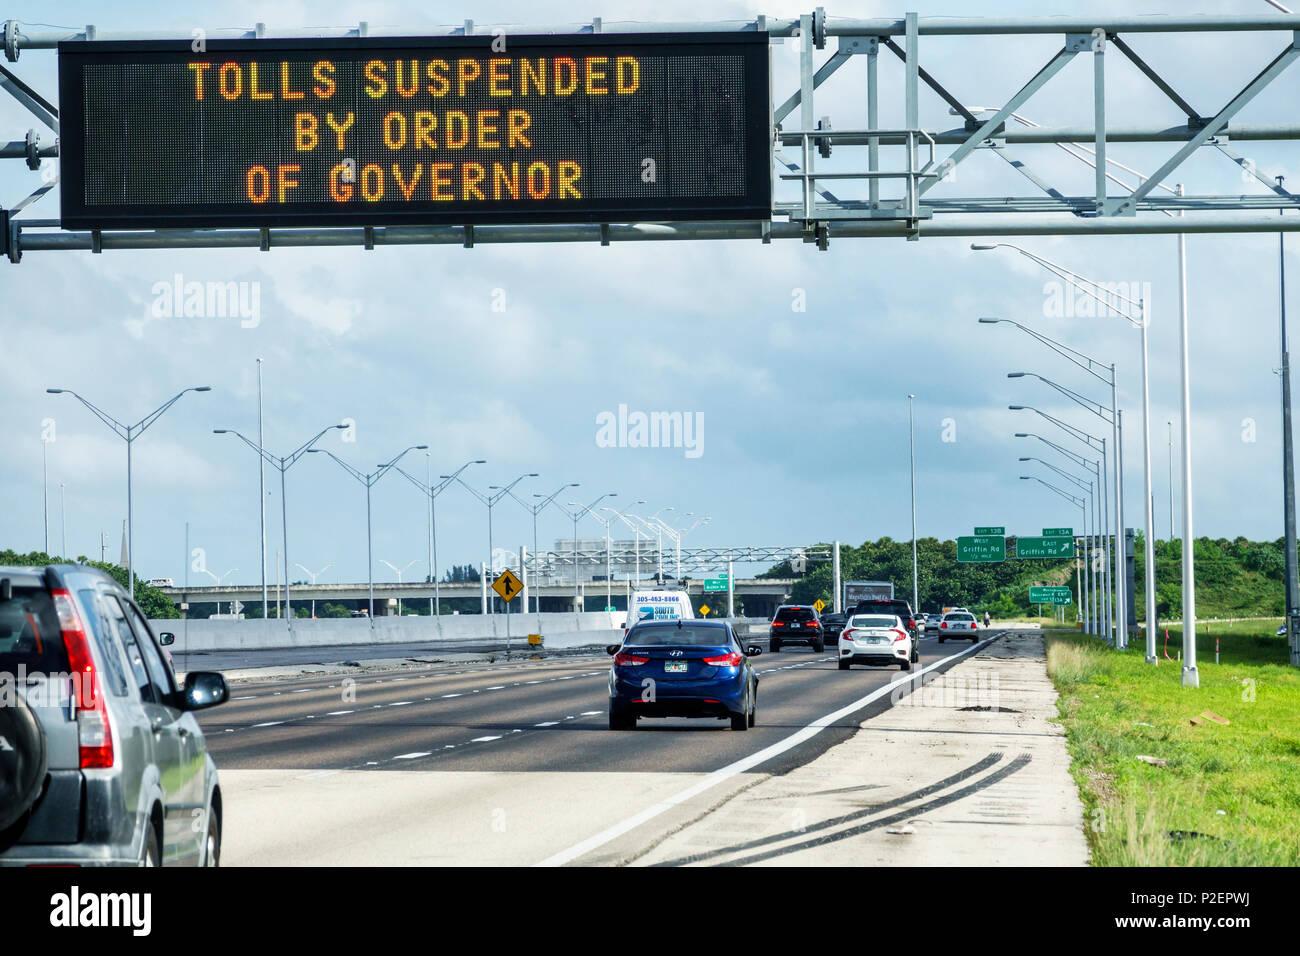 Florida Miami Hurricane Irma approaching preparation Interstate I-75 I75 electronic sign evacuation tolls suspended order governor highway traffic evacuating cars - Stock Image